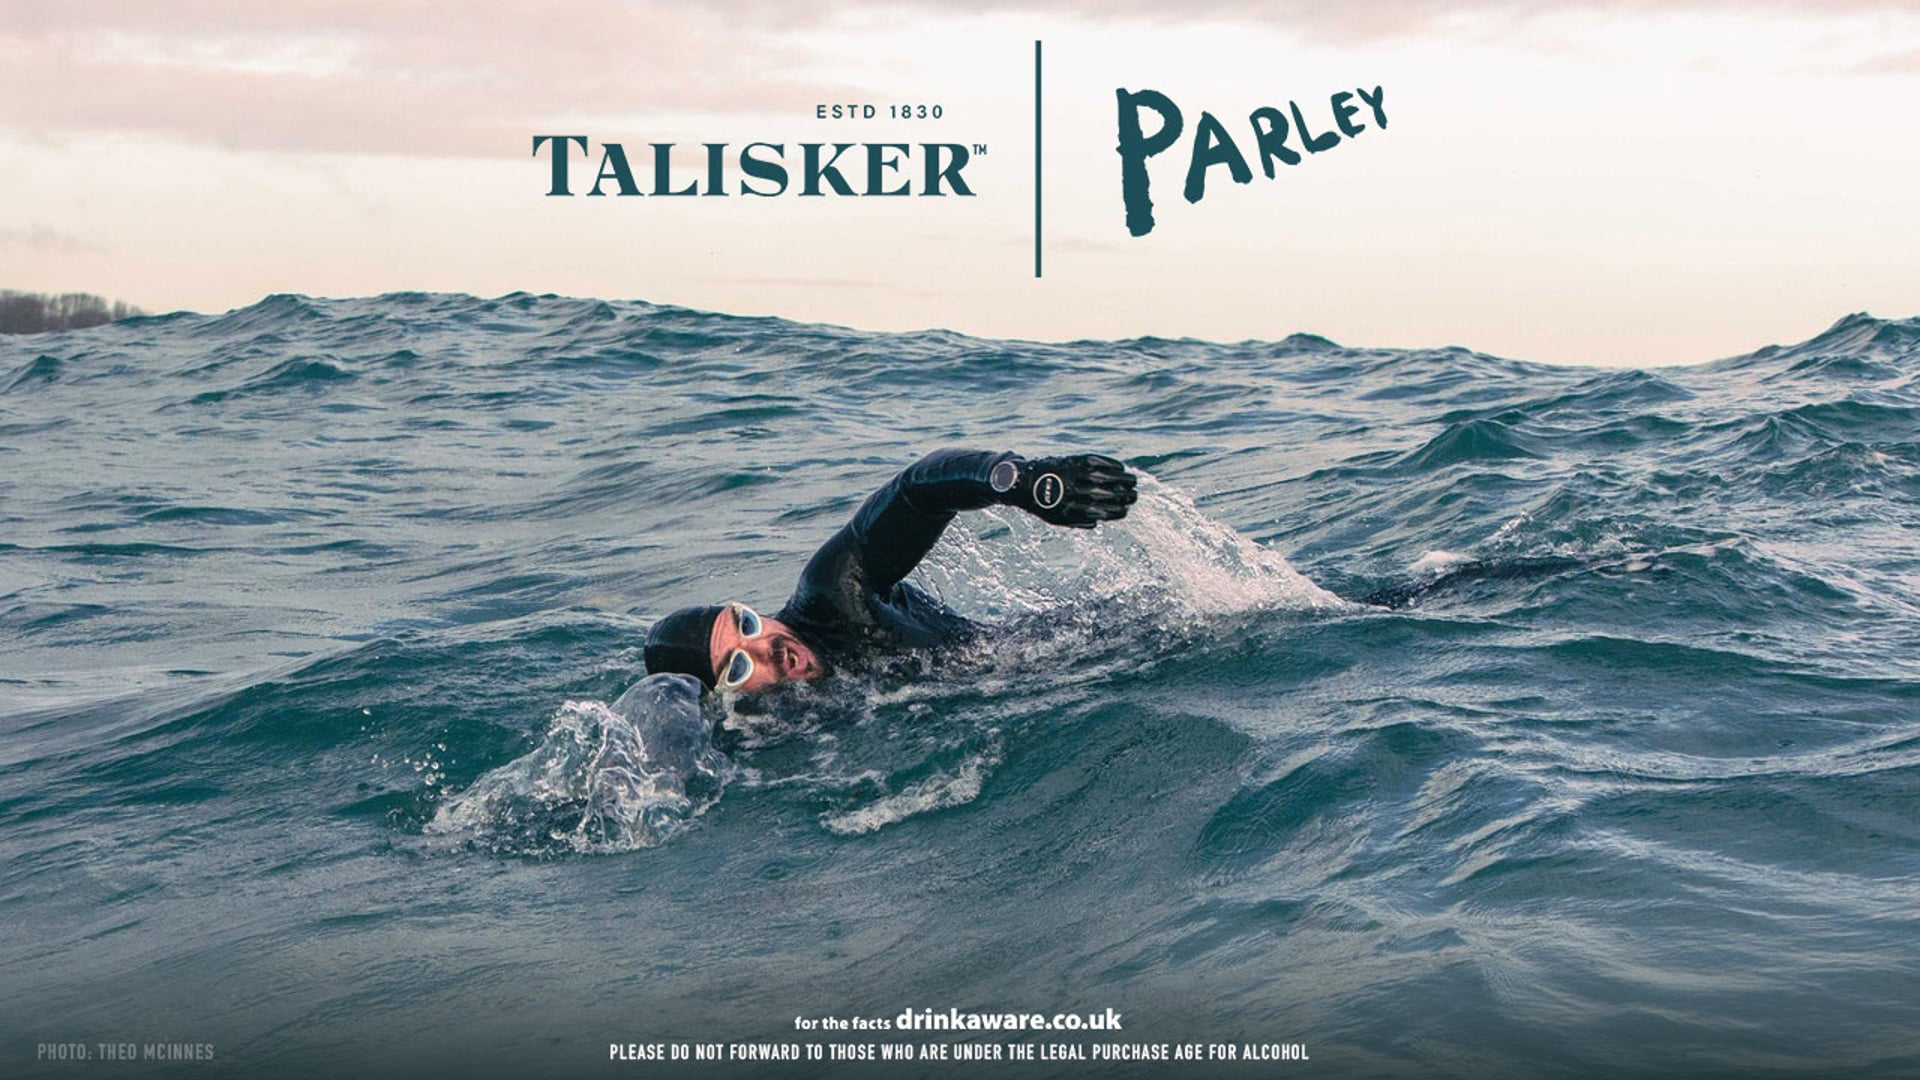 Talisker & Parley | Ross Edgley